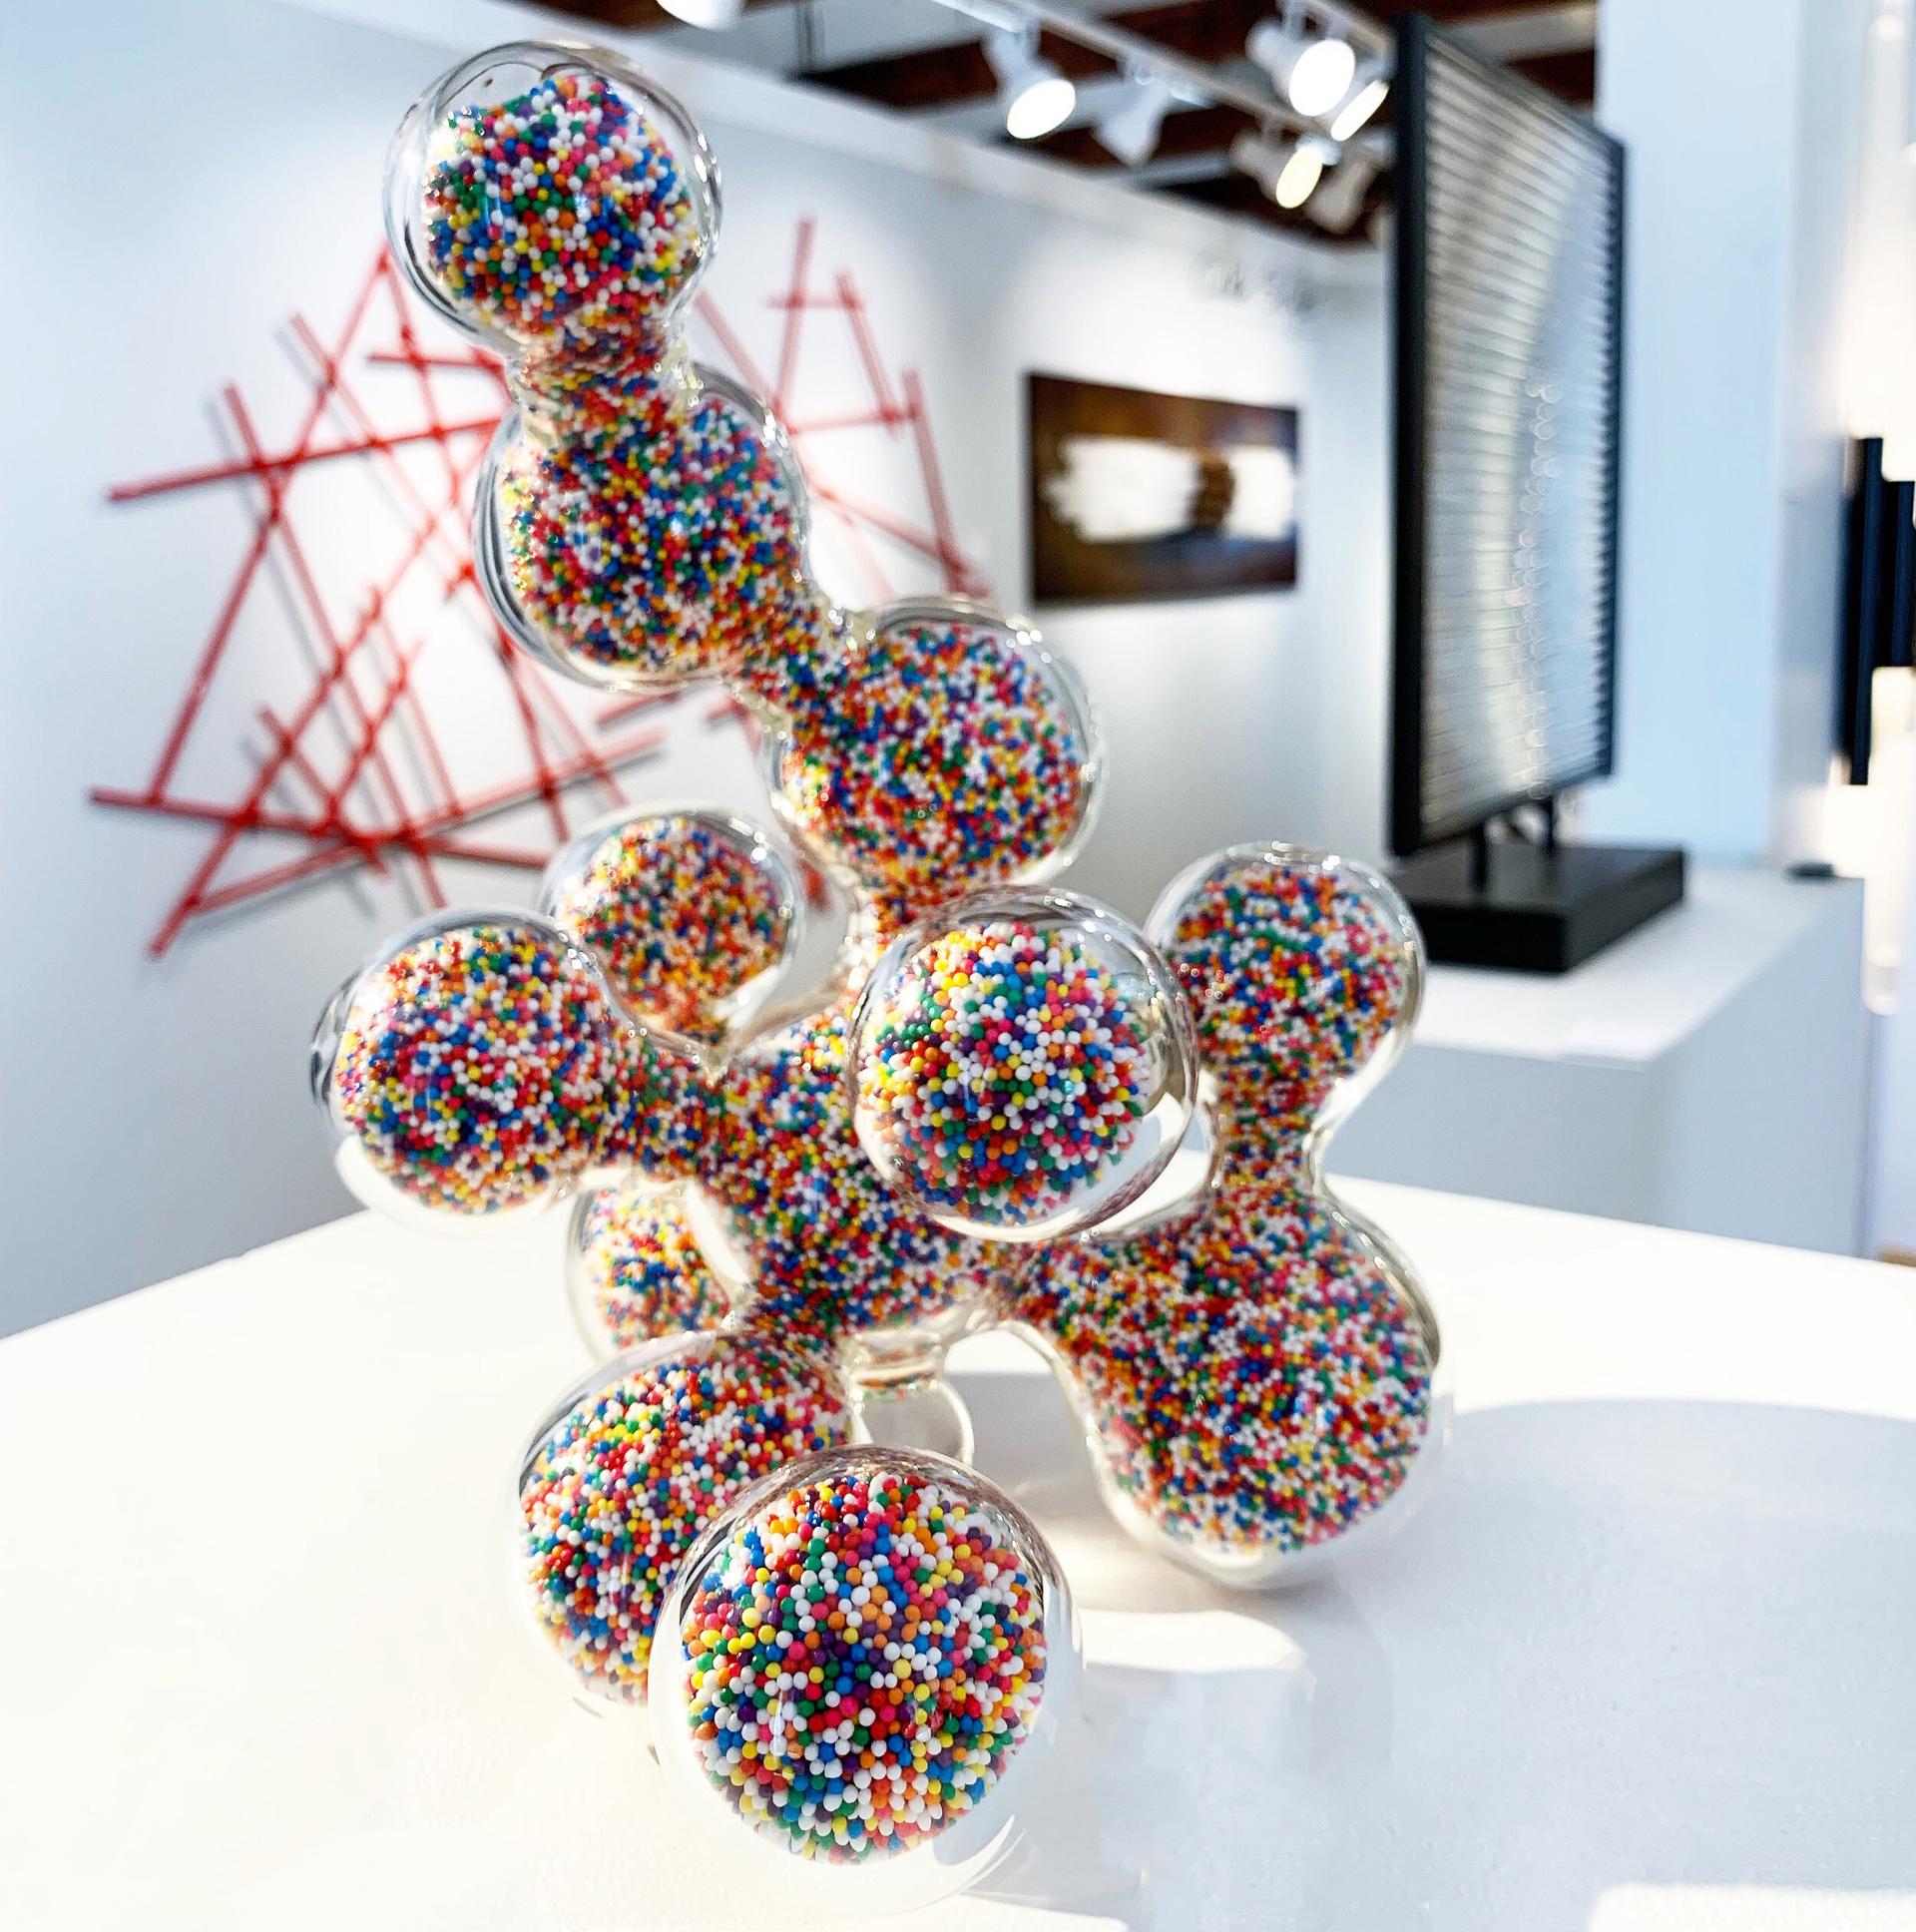 Happiness Molecule by Caleb Siegler